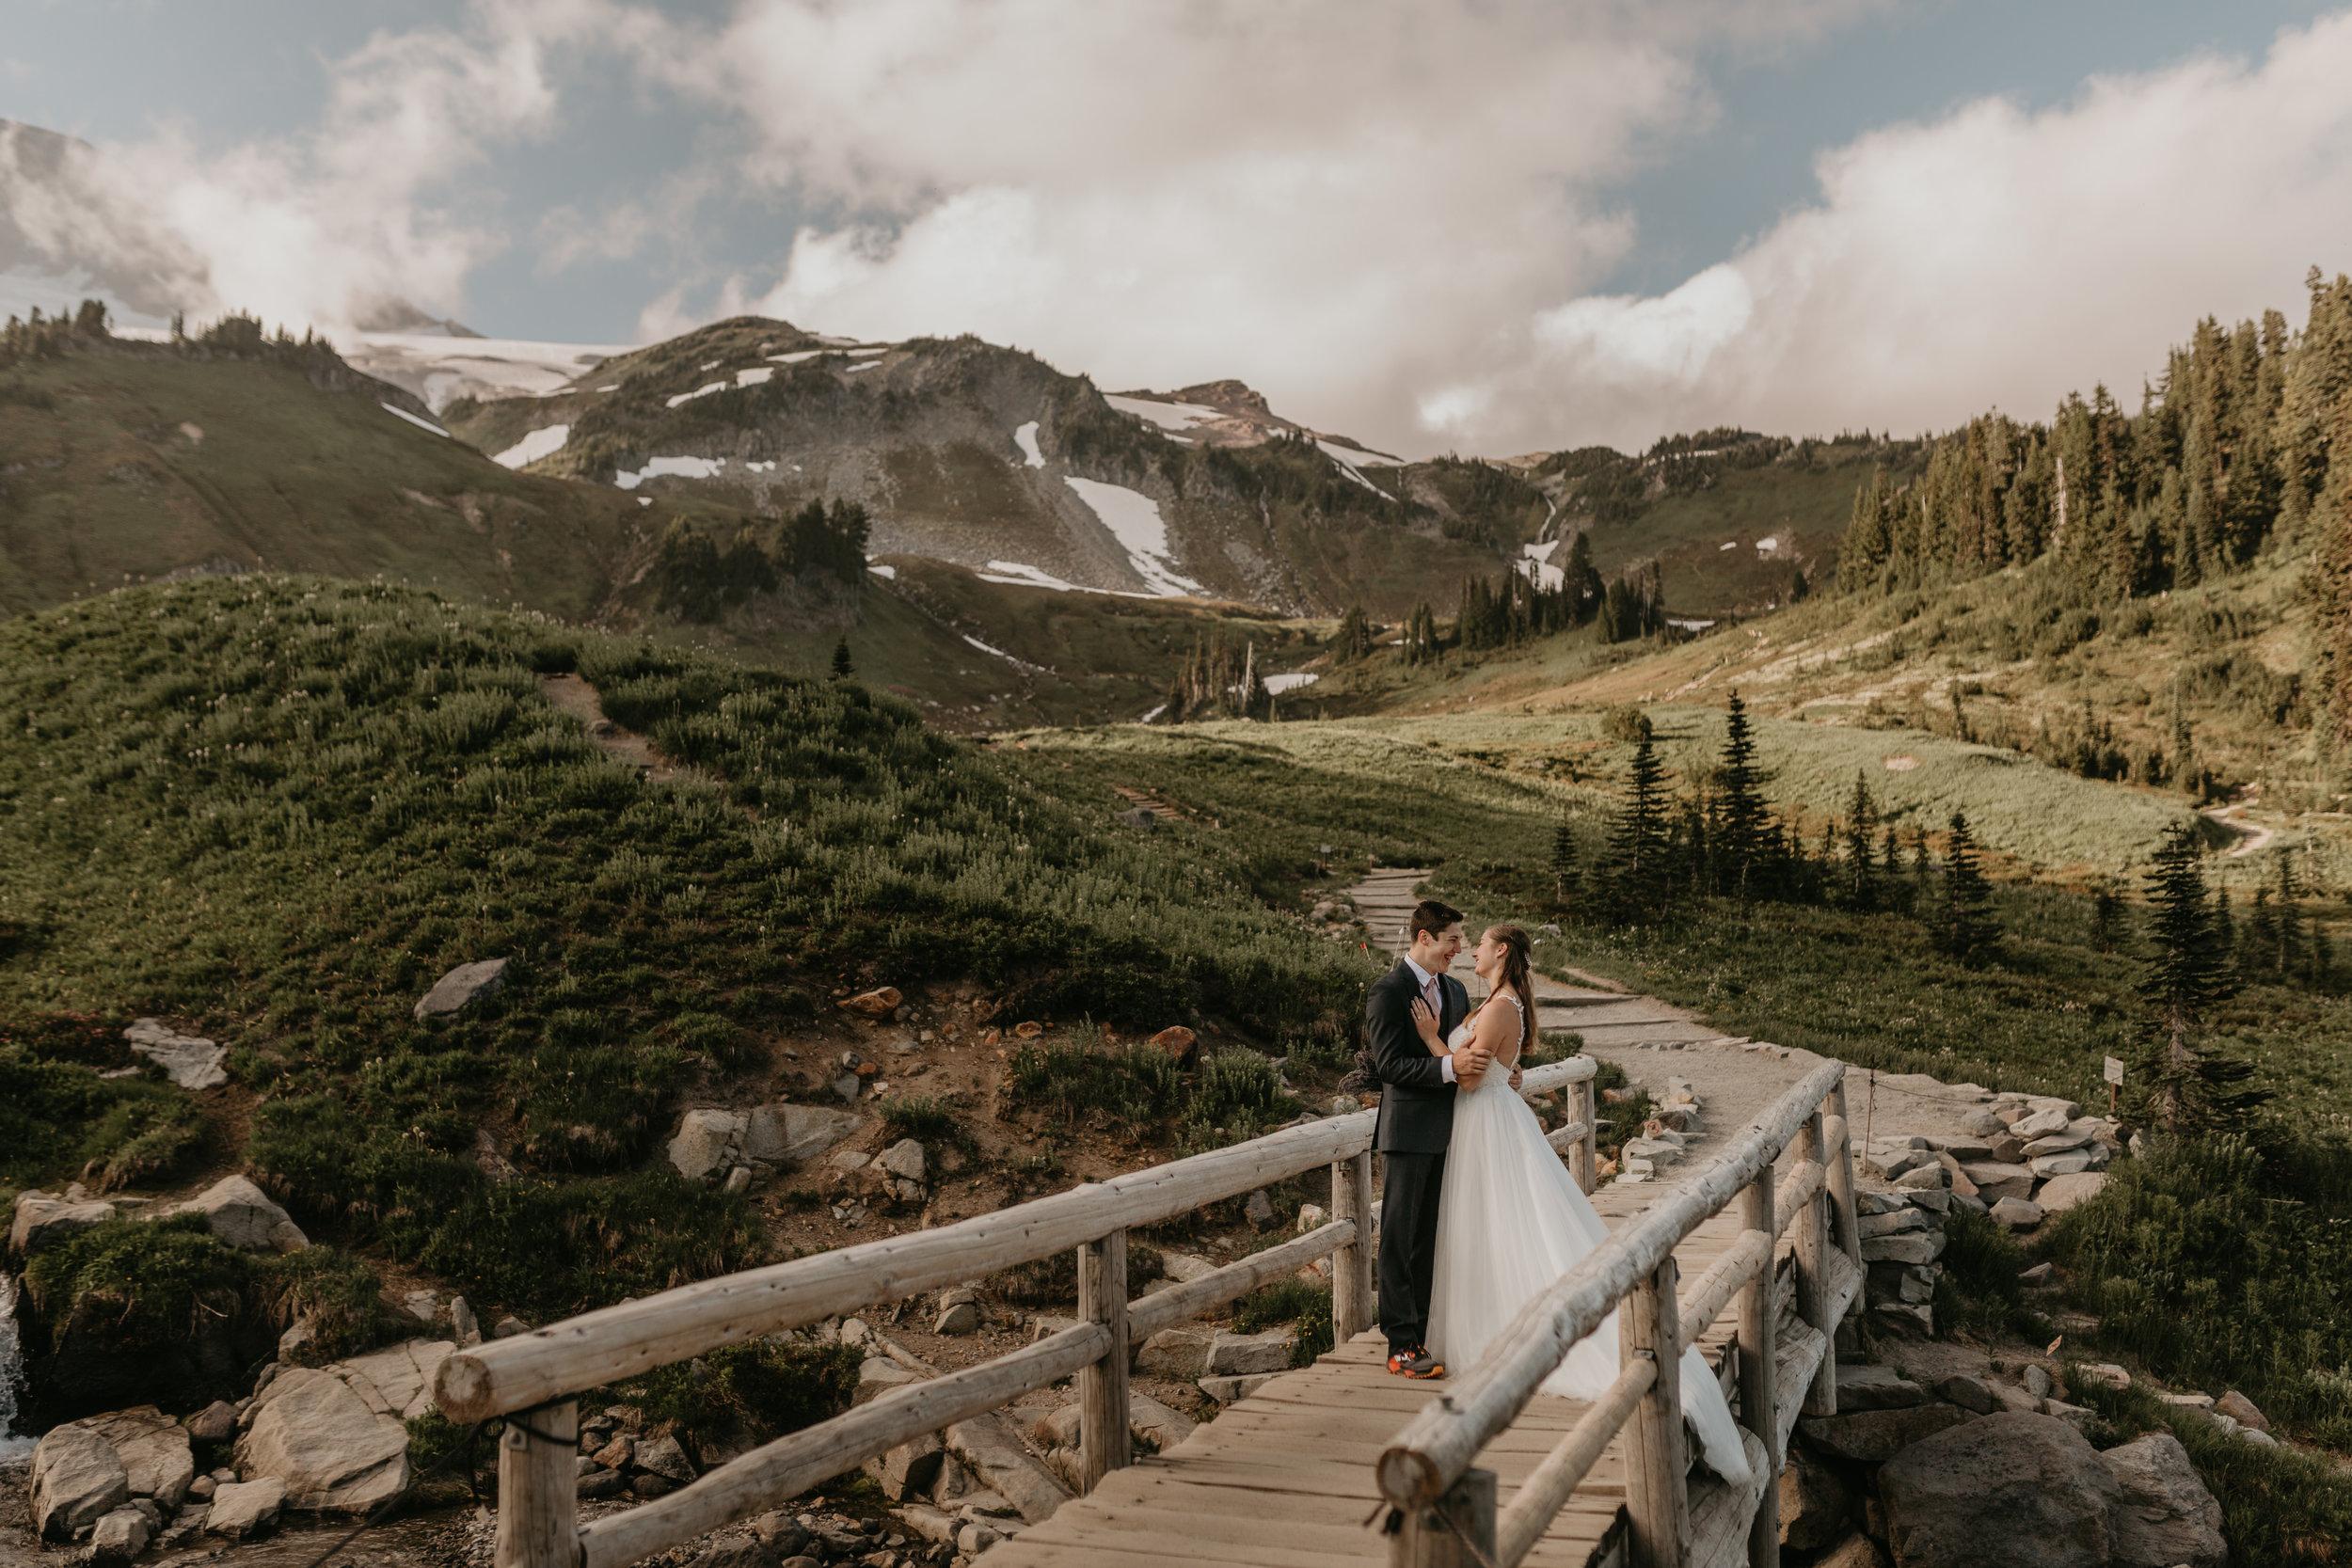 Nicole-Daacke-Photography-Mt-Rainier-elopement-photographer-washington-mountain-epic-wedding-photography-wildflowers-at-rainier-pine-tree-cloudy-summer-day-at-mountain-rainier-11.jpg